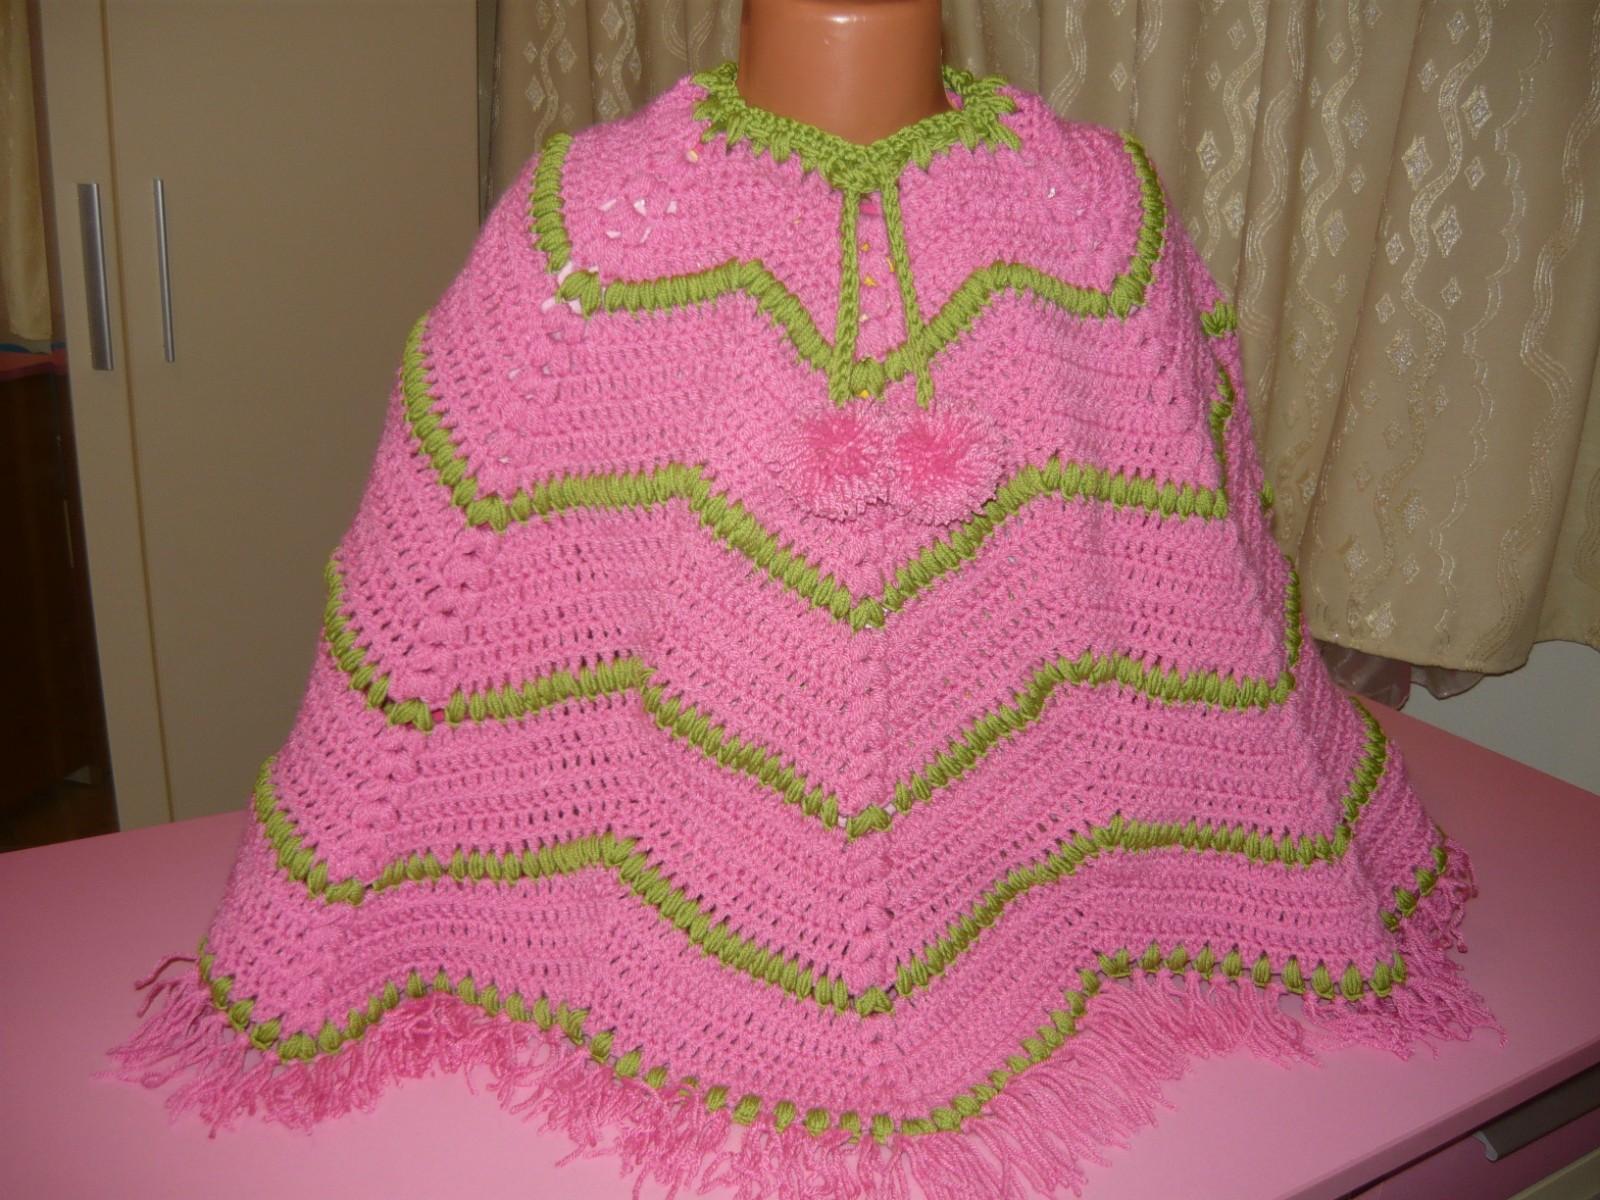 Hainute crosetate-tricotate: poncho crosetat sau tricotat